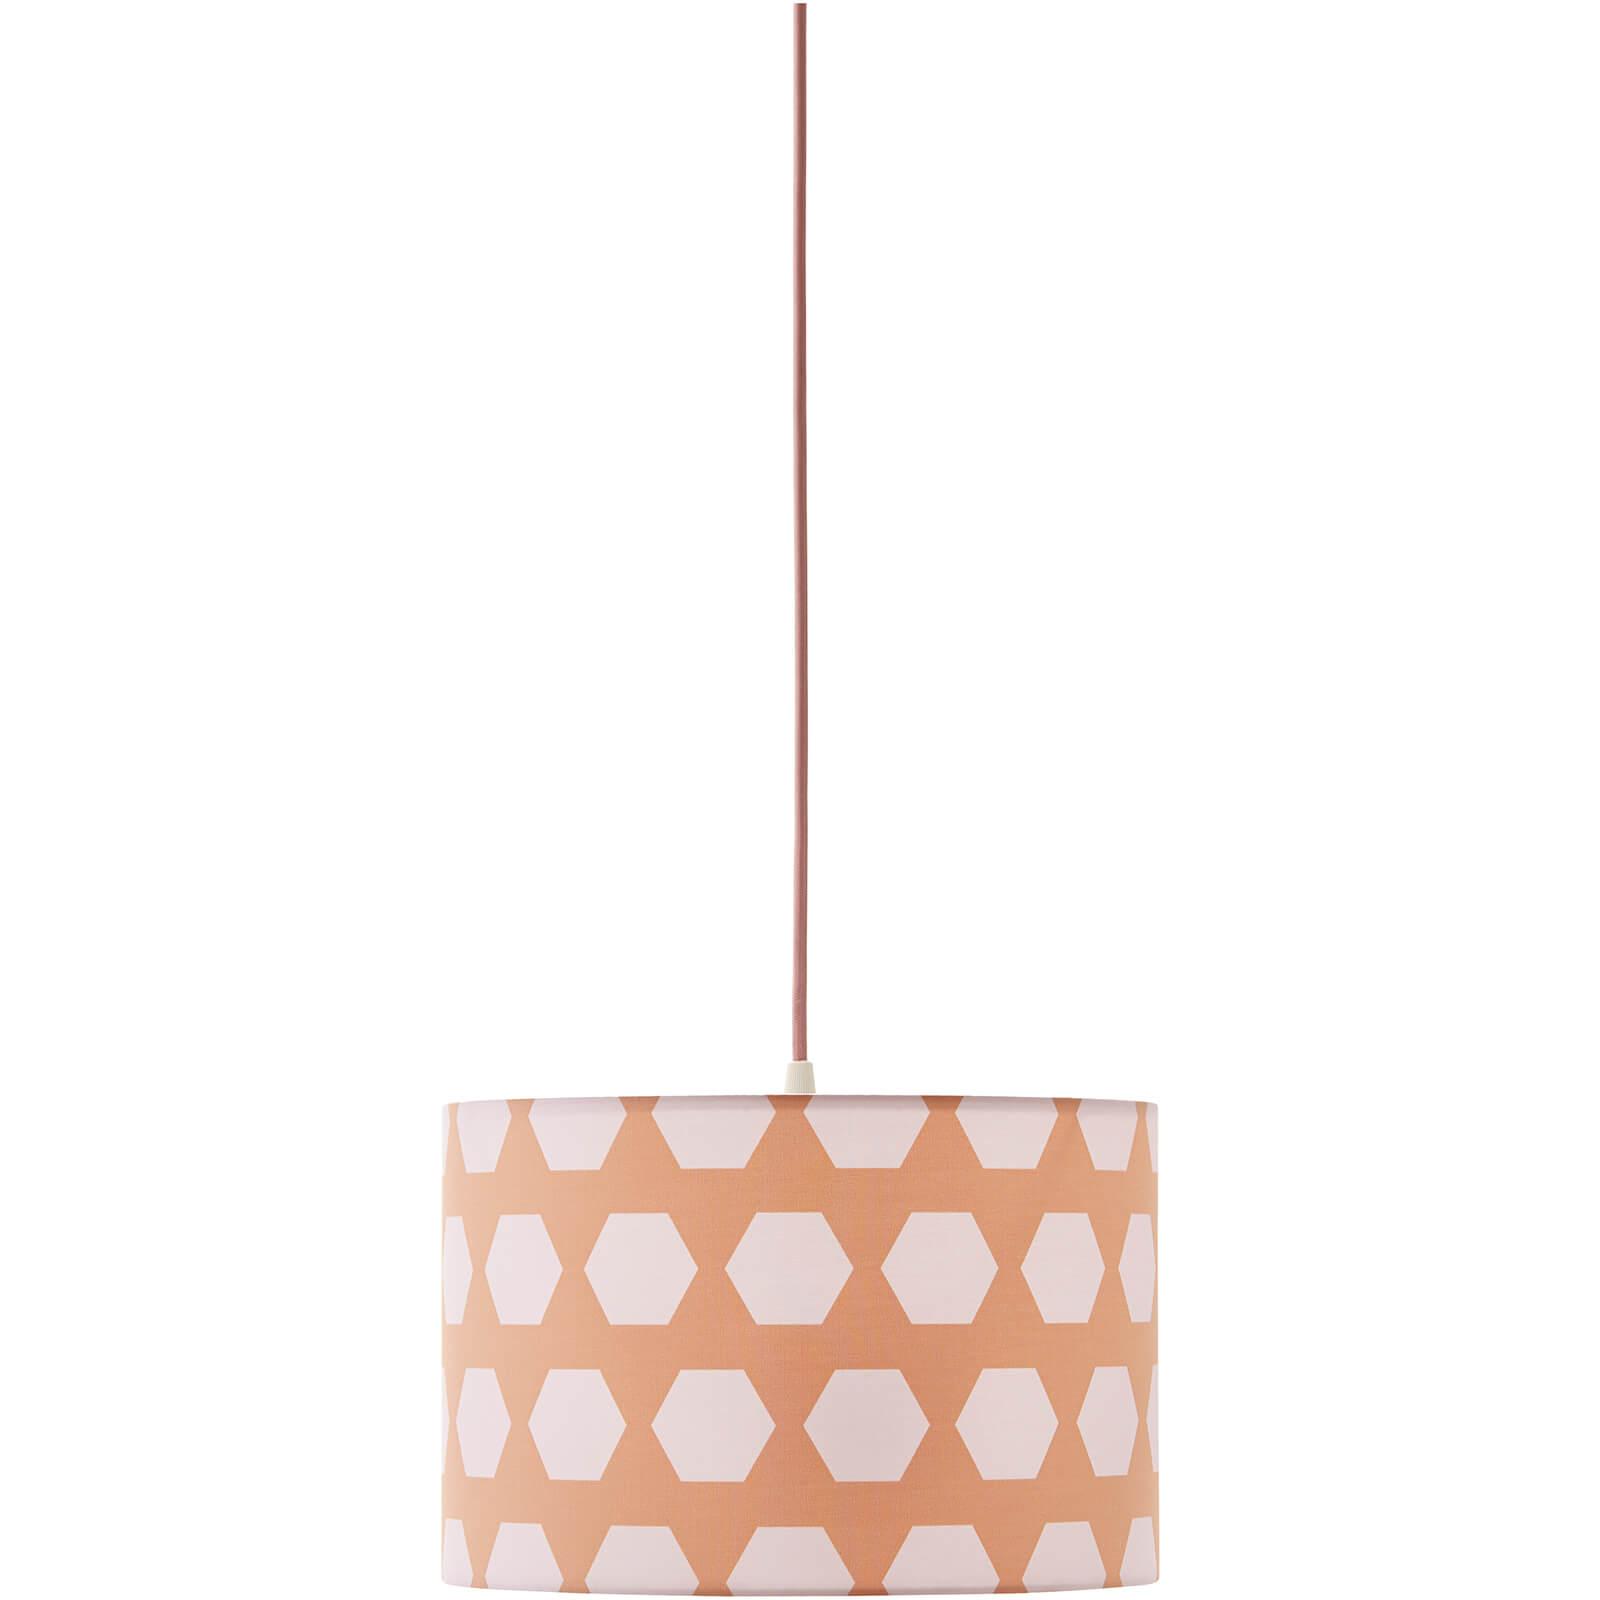 Kids Concept Ceiling Hexagon Lamp - Apricot